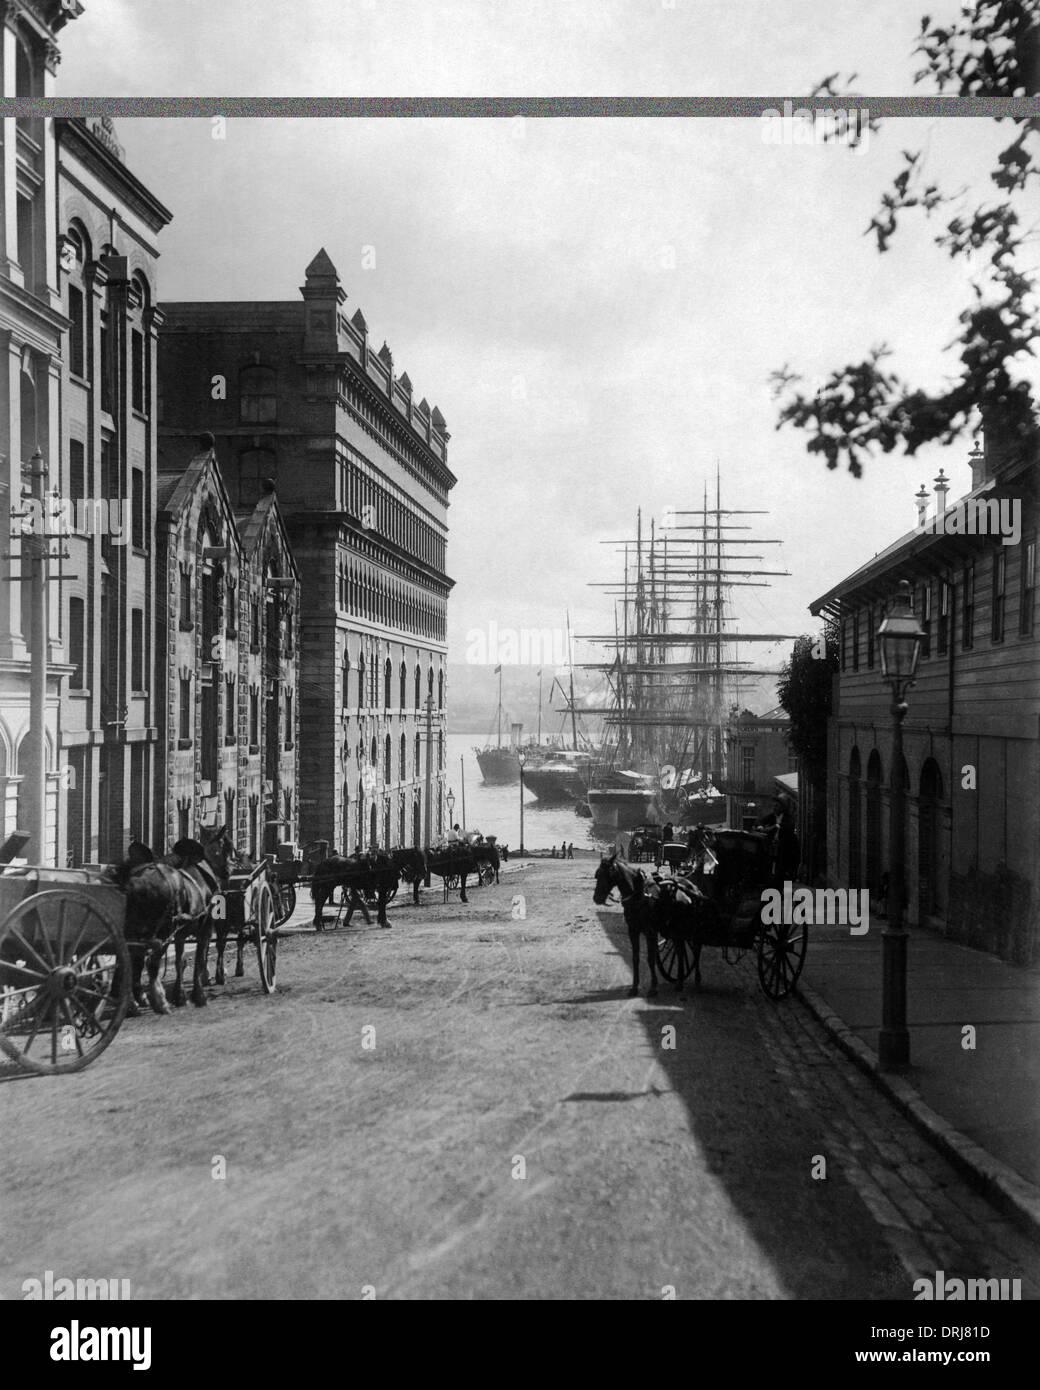 Phillip Street and Harbour, Sydney, Australia - Stock Image